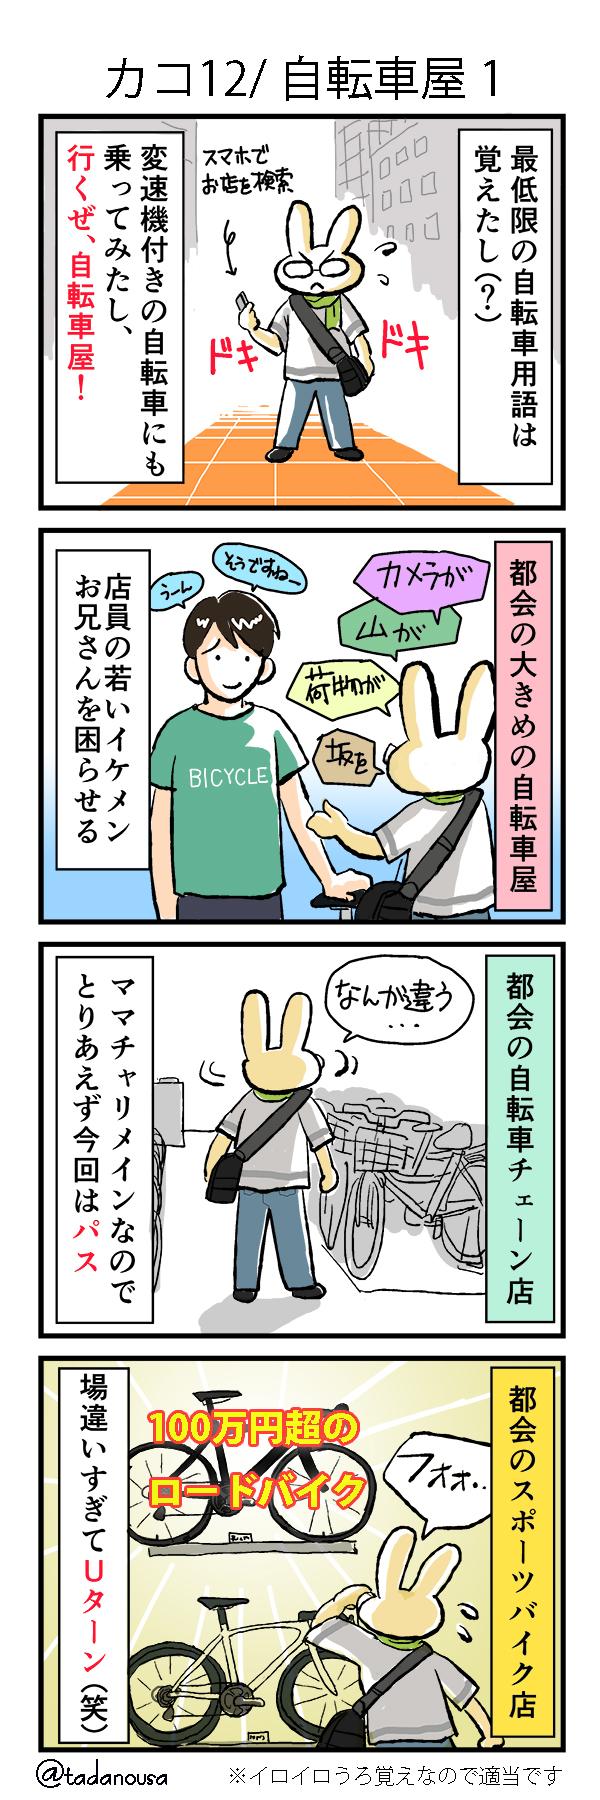 bike_4koma_kako012_s.jpg